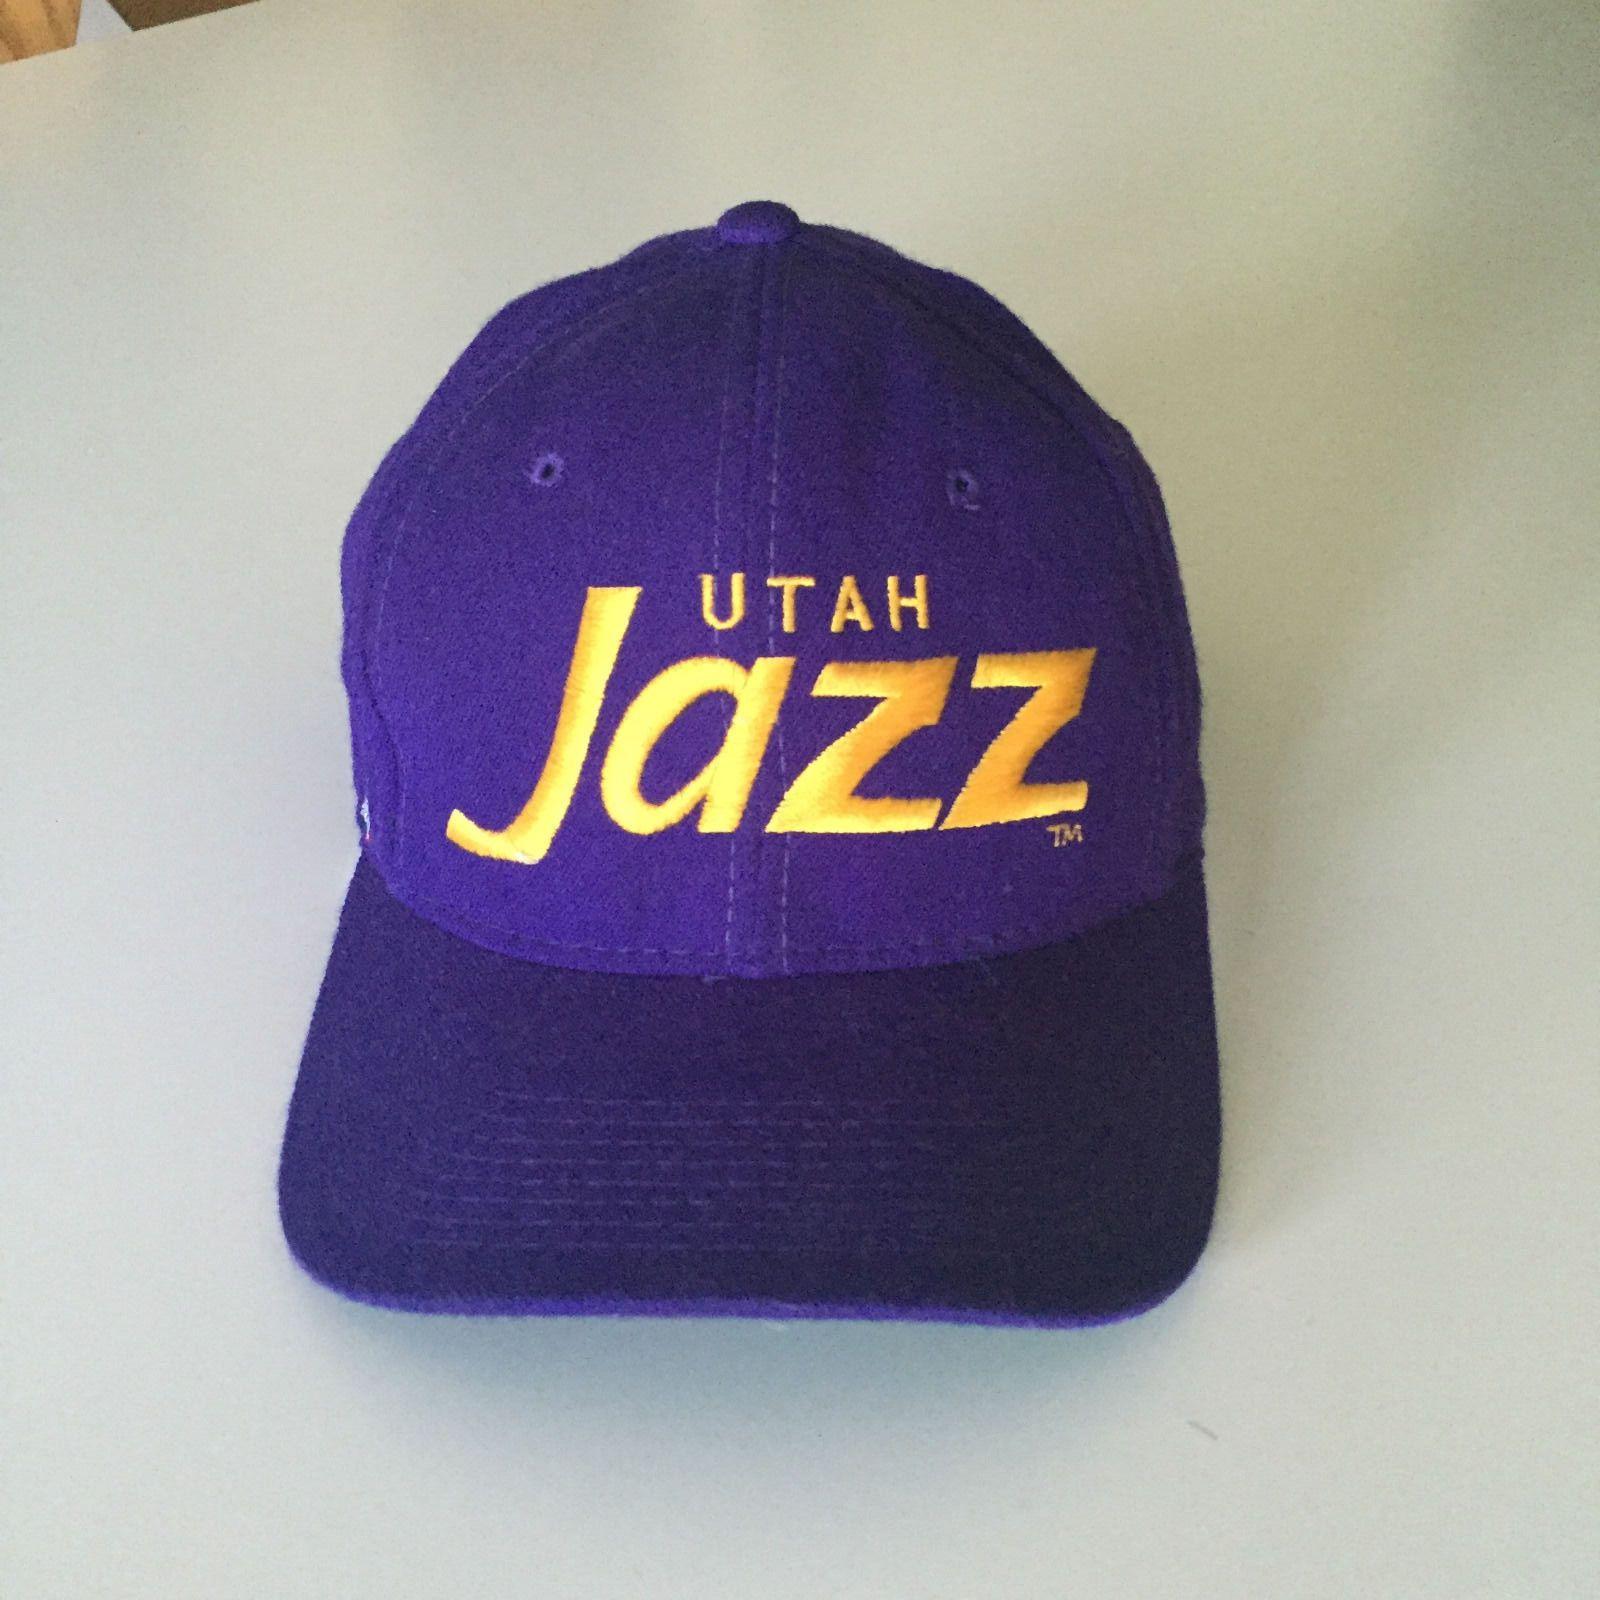 9b2be0a5 Vintage Utah Jazz Sports Specialties Snapback | Snapbacks | Snapback ...